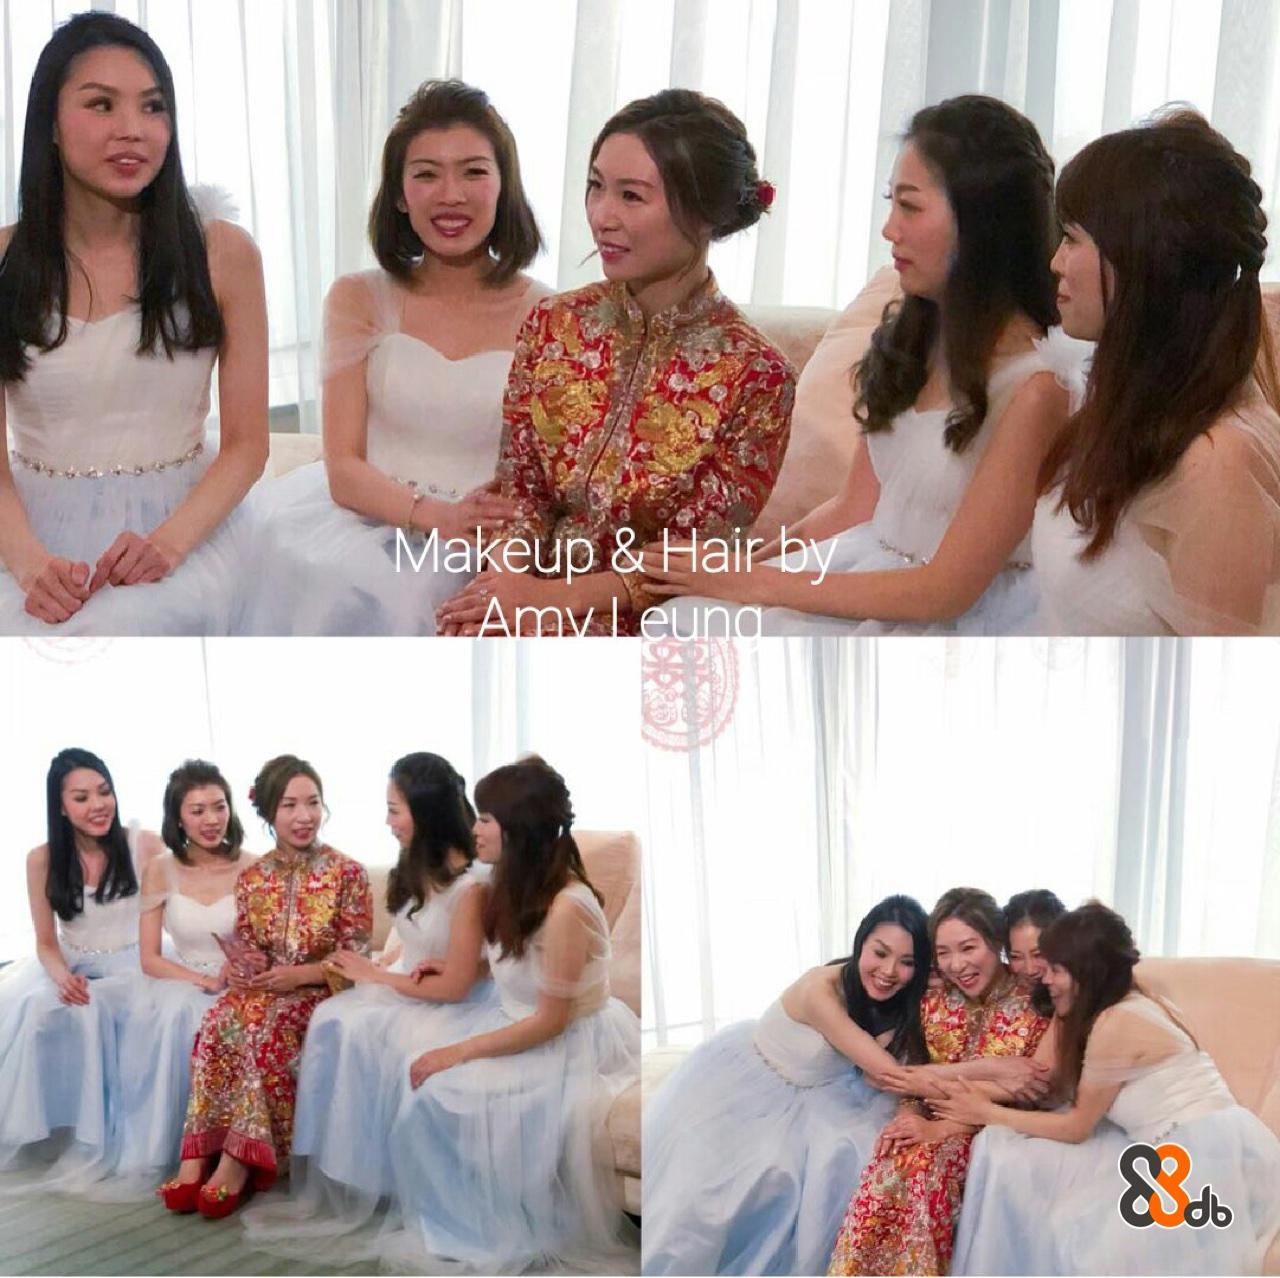 Makeup & Hair b  woman,gown,bride,bridesmaid,wedding dress